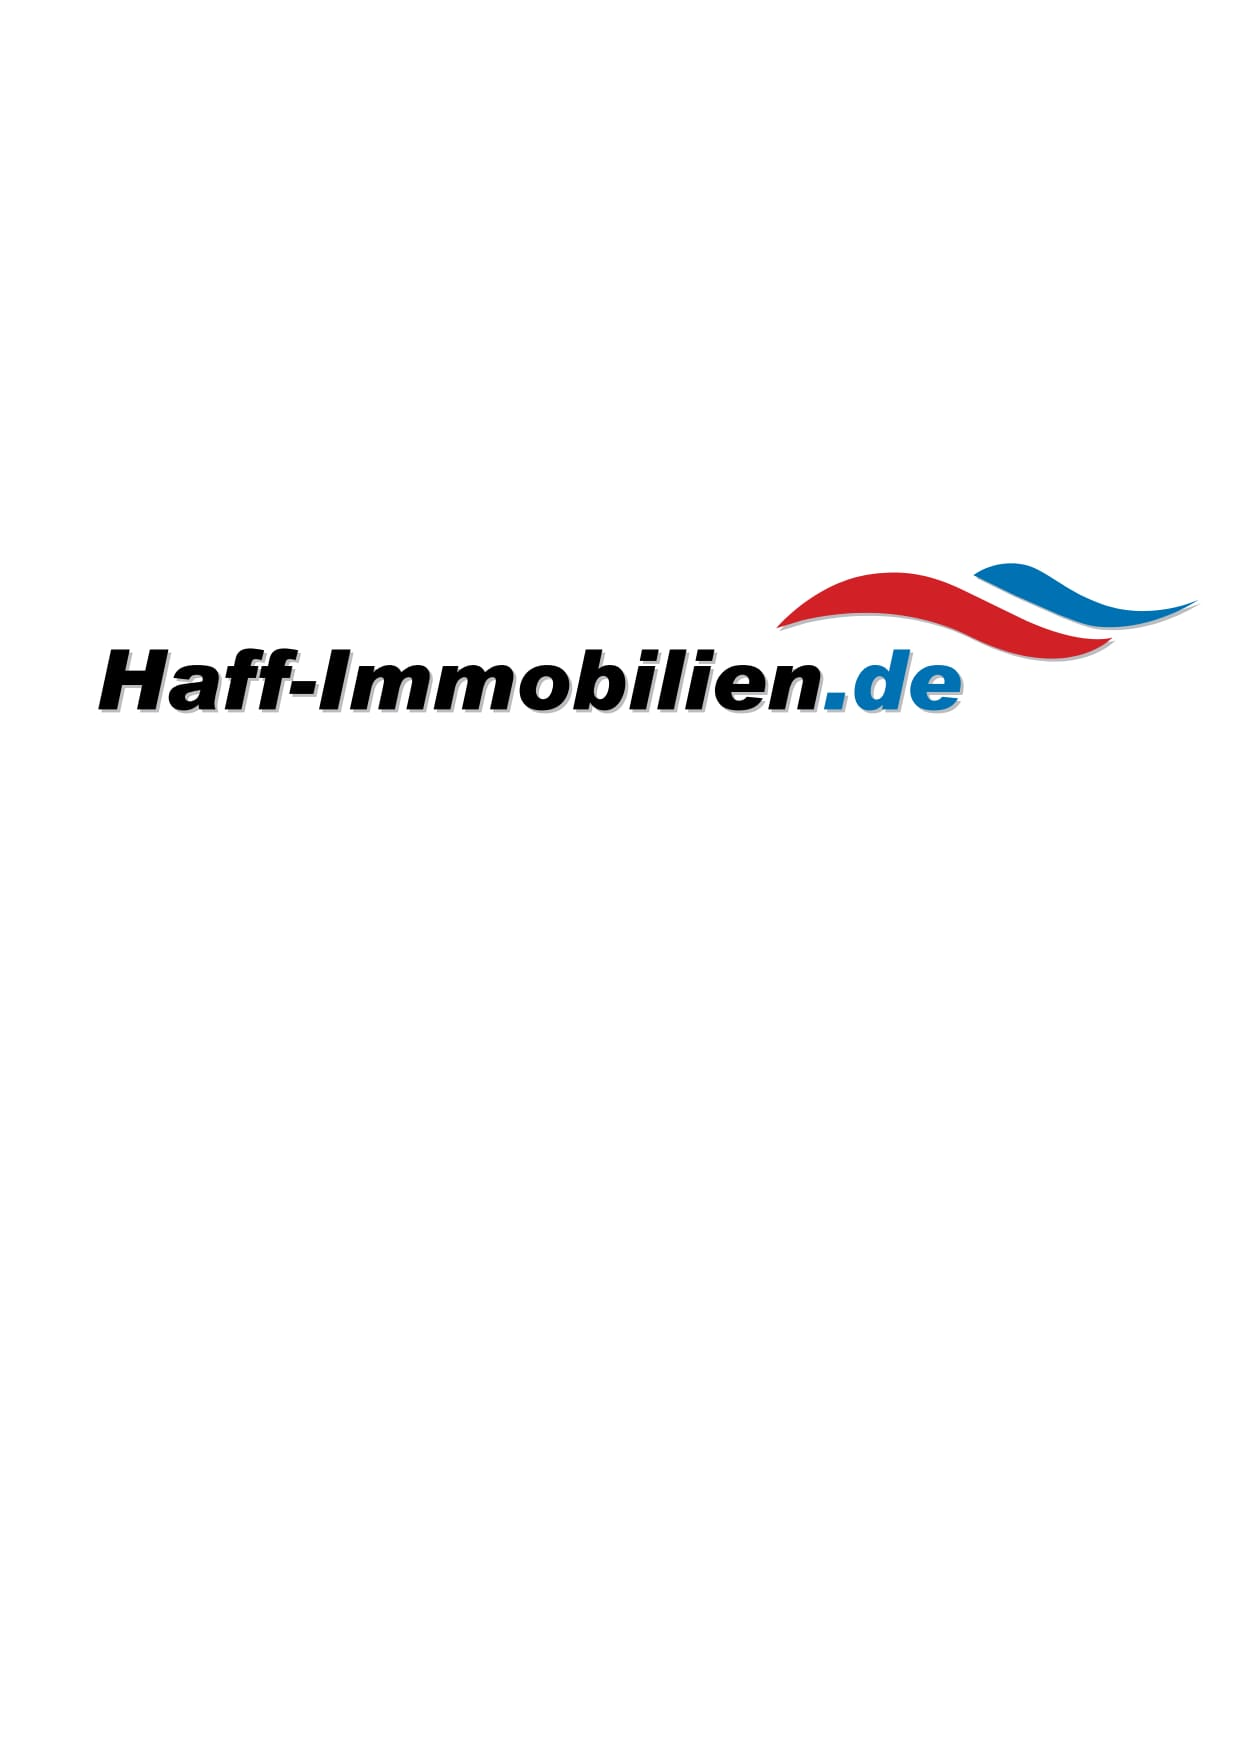 Ihr Makler vor Ort, Haff-Immobilien.de , Thomas Michaelis